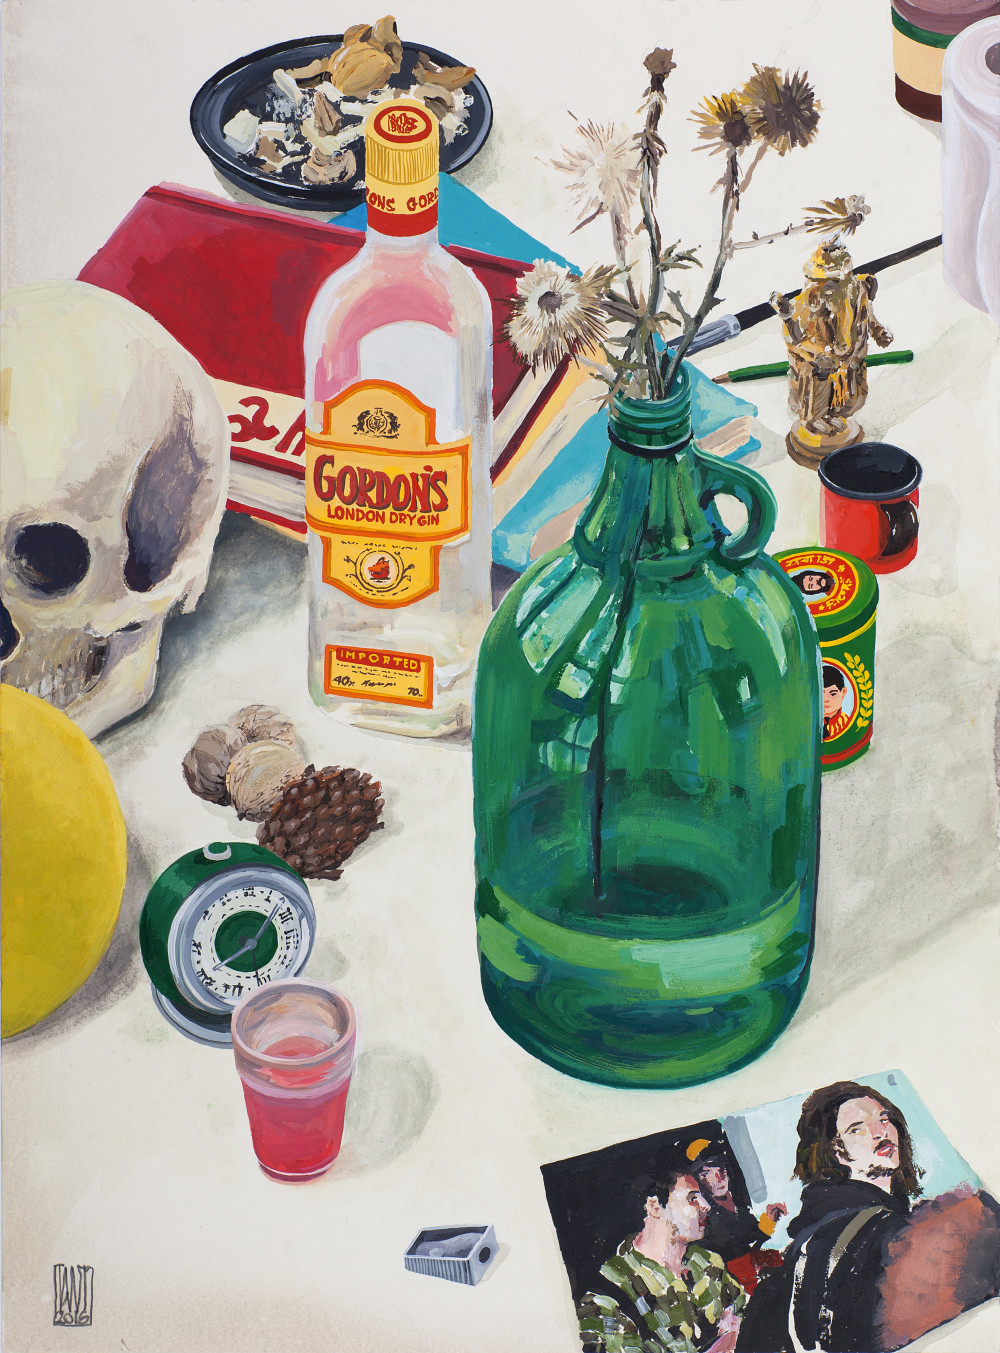 bench-talk-broken-fingaz-Reality-Check.-TANT-ATTACHMENTS-watercolor-and-gouache-on-paper-37x50-cm-2016-Galleria-Varsi-e1483970923422.jpg